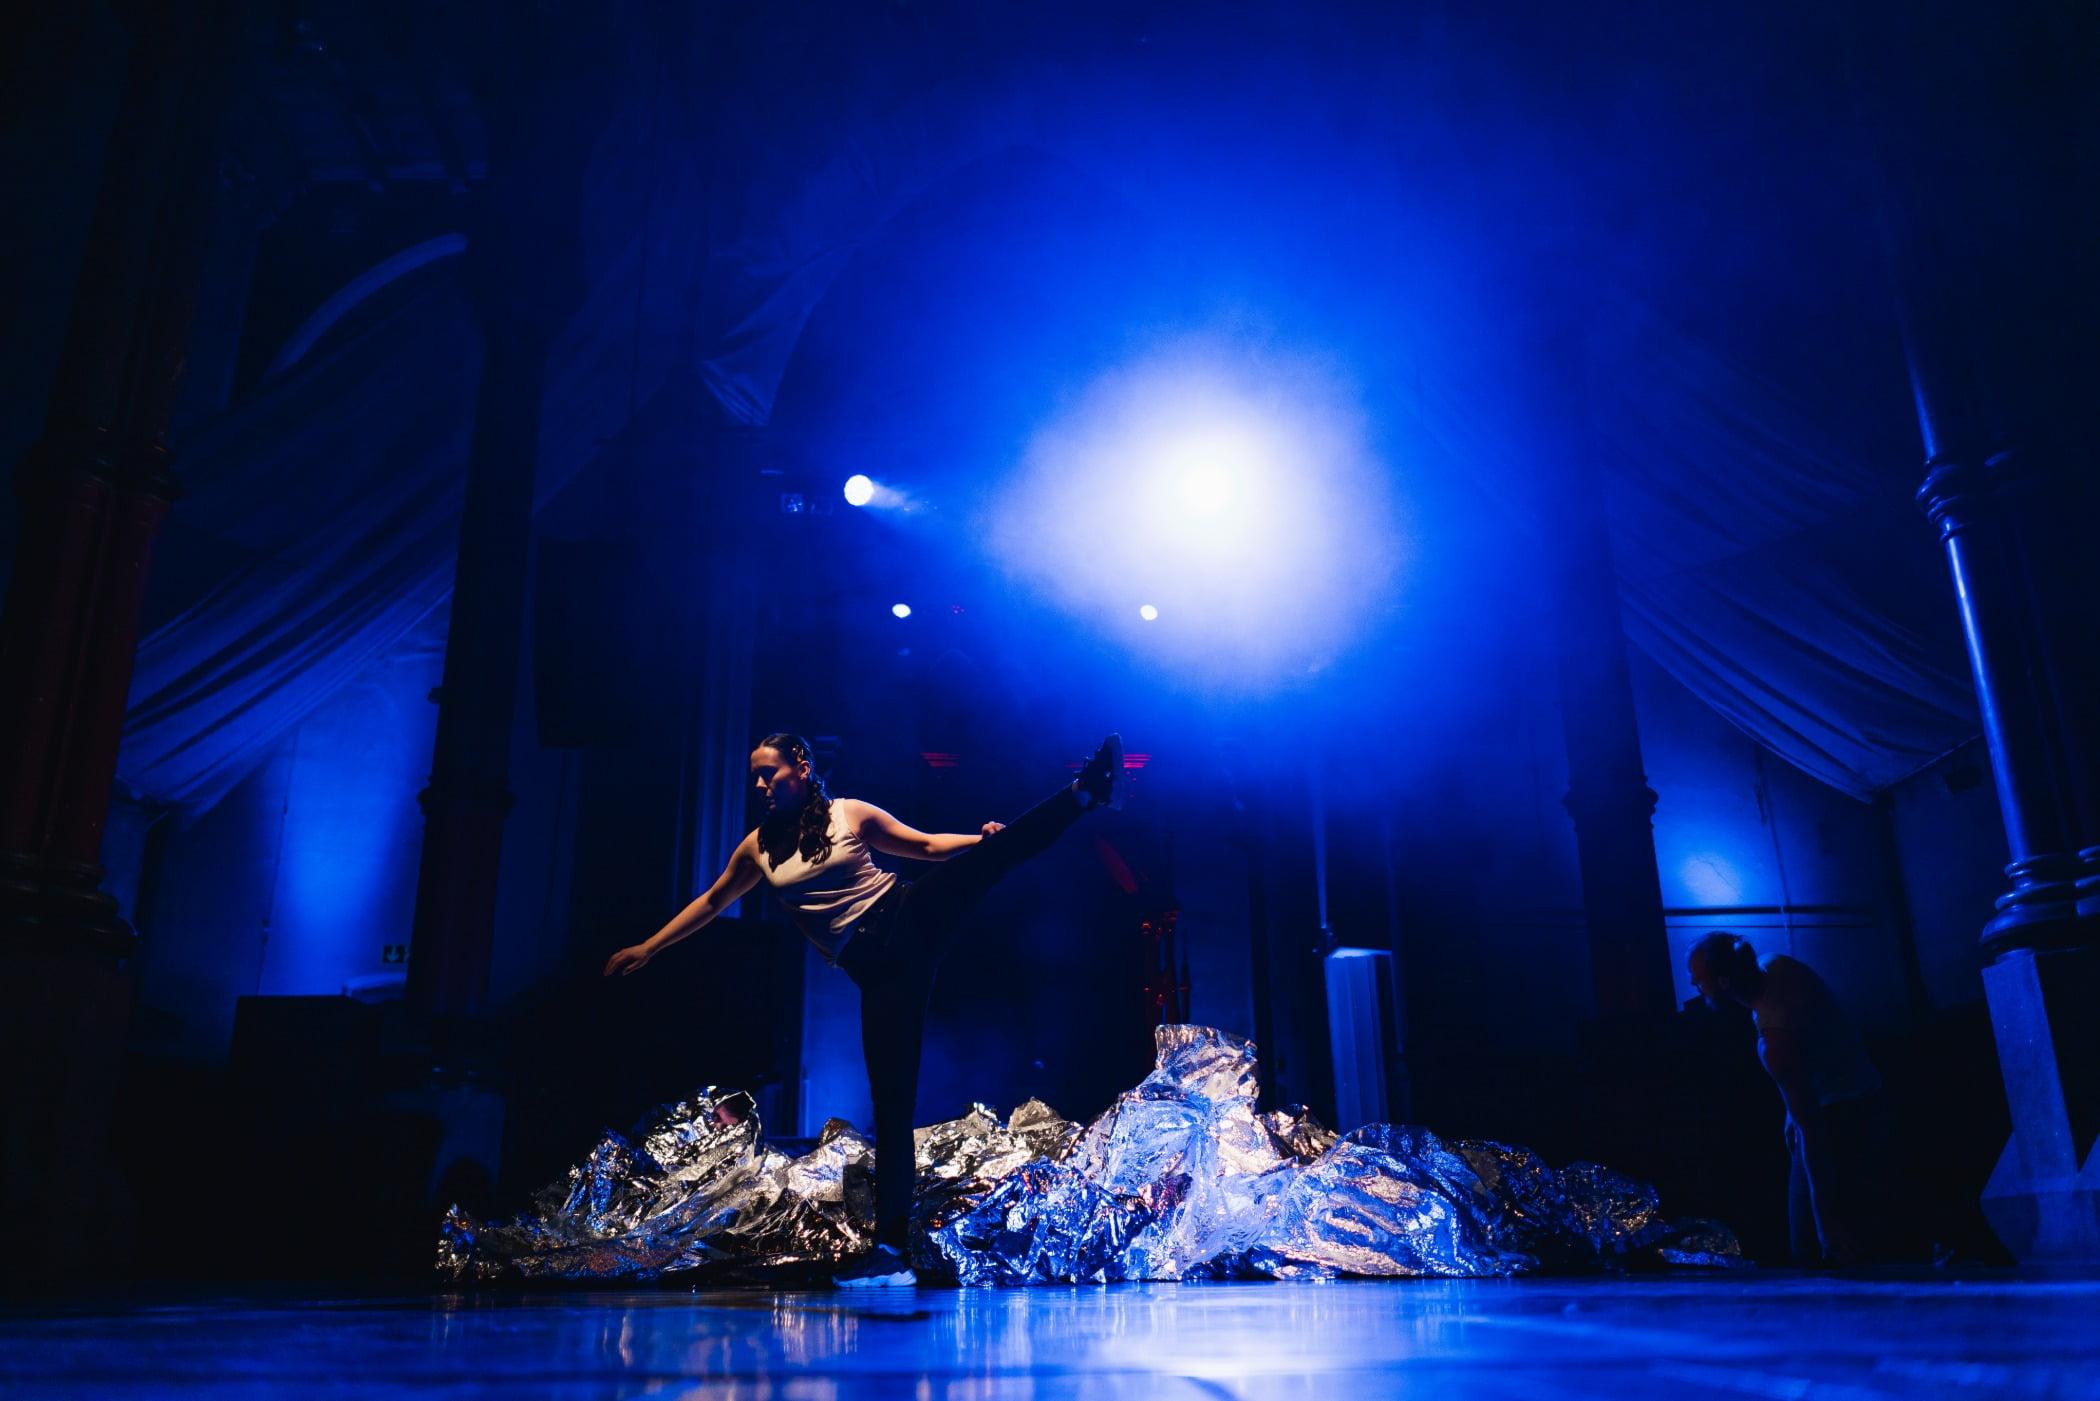 Music artist, Concert dance, Performance art, Performing arts, heater, Stage, Entertainment